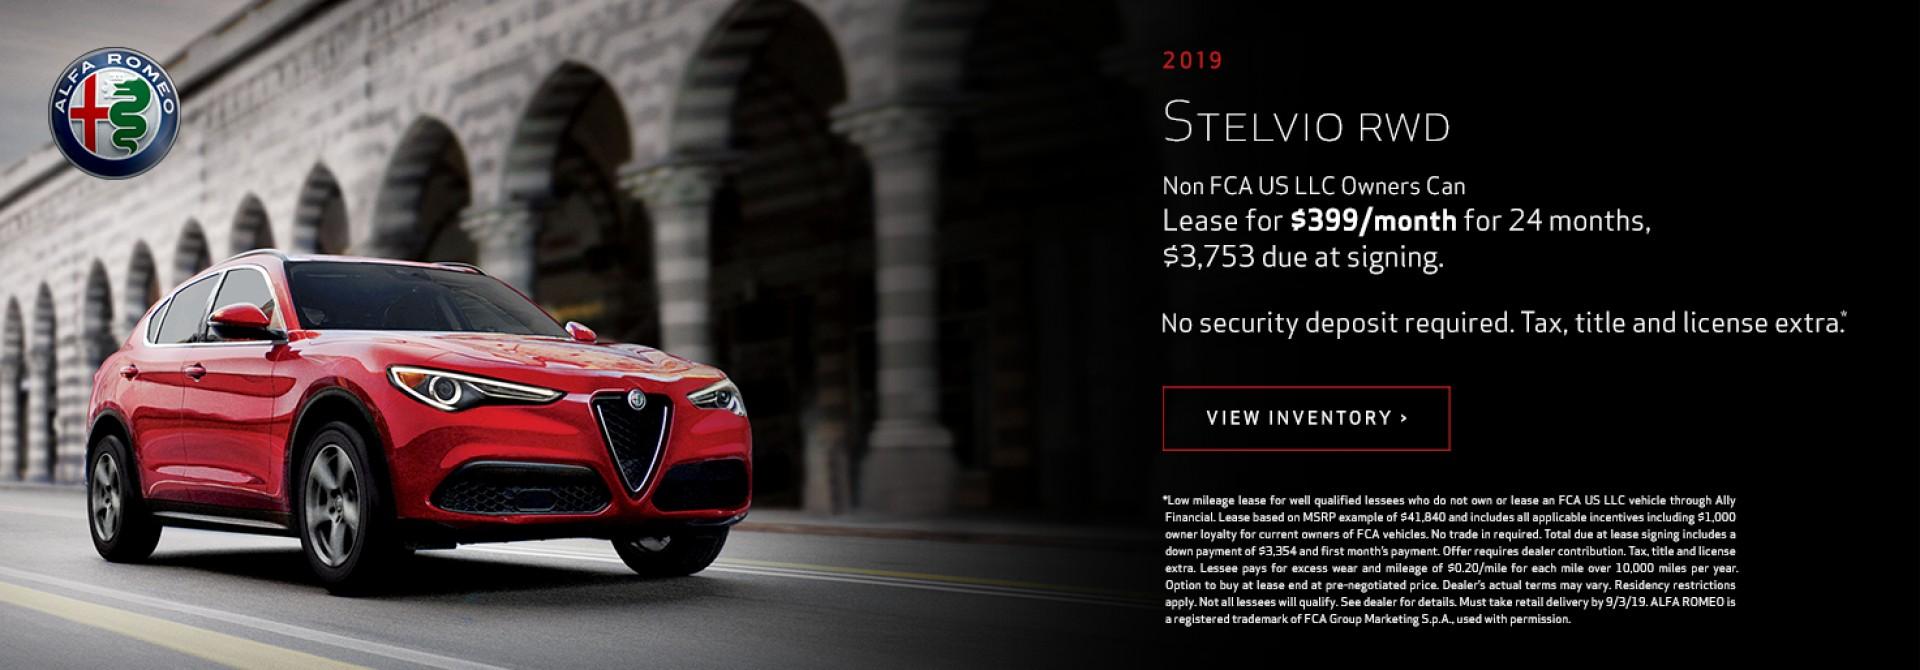 AlfaRomeo-2019-Stelvio-RWD-Lease-Aug-Tile-Dig-NY-LA-Miami